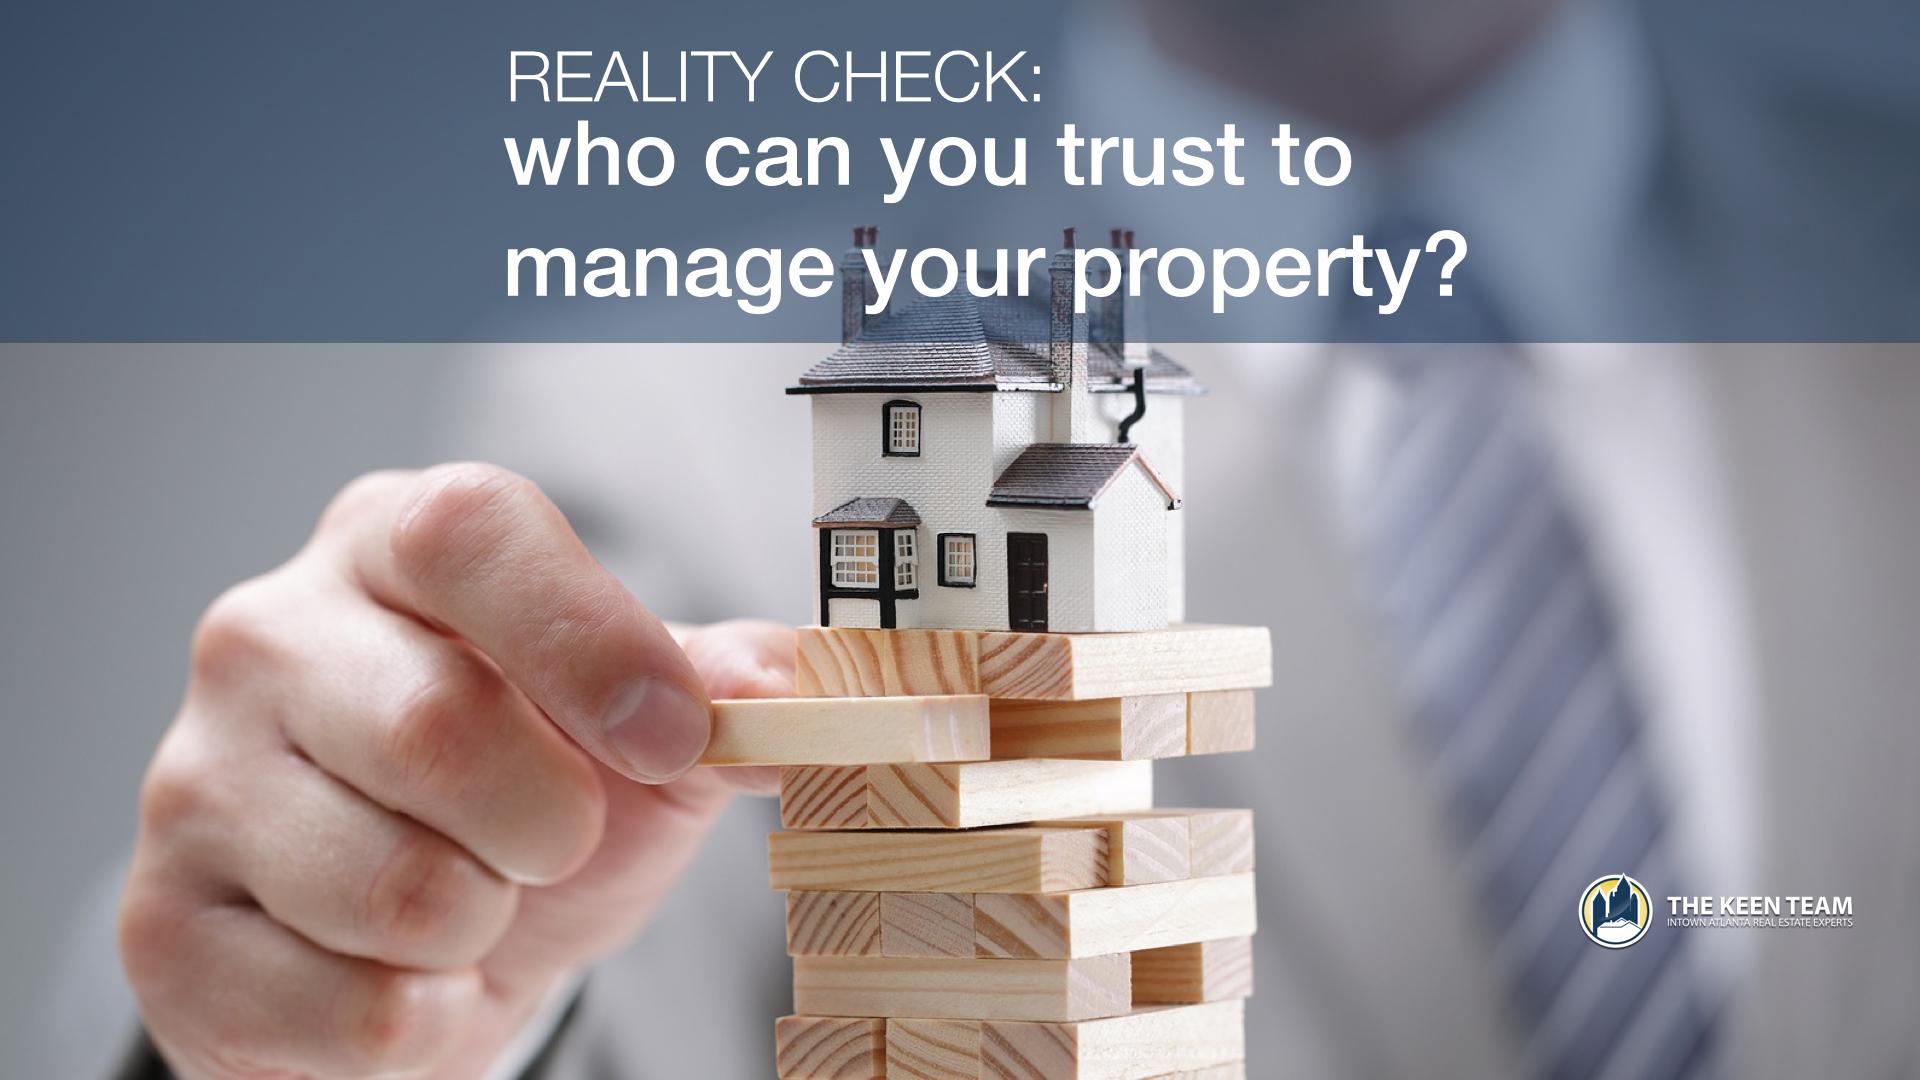 Trustworthy Atlanta Property Manager